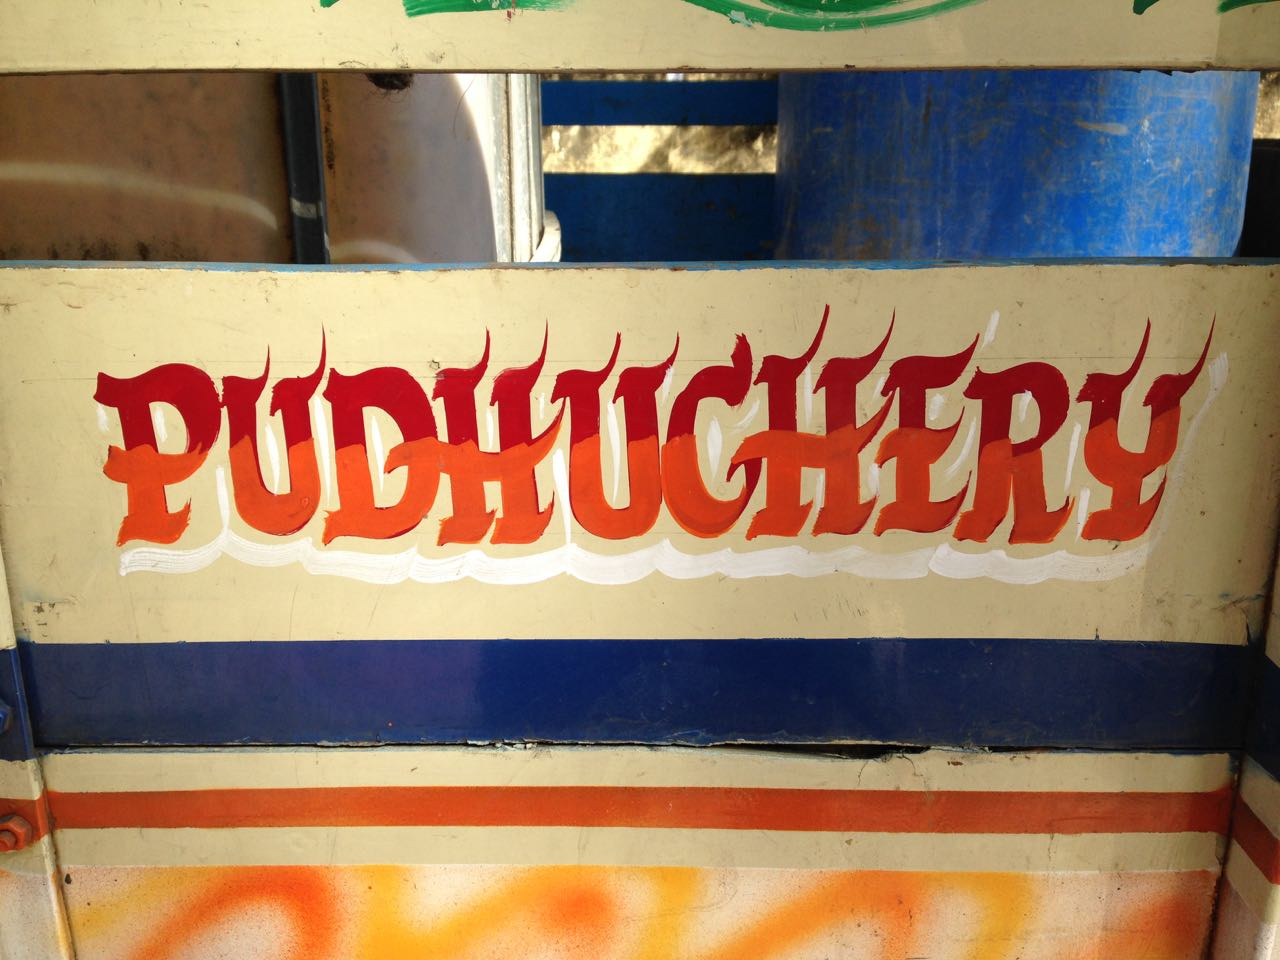 Pudhucherry